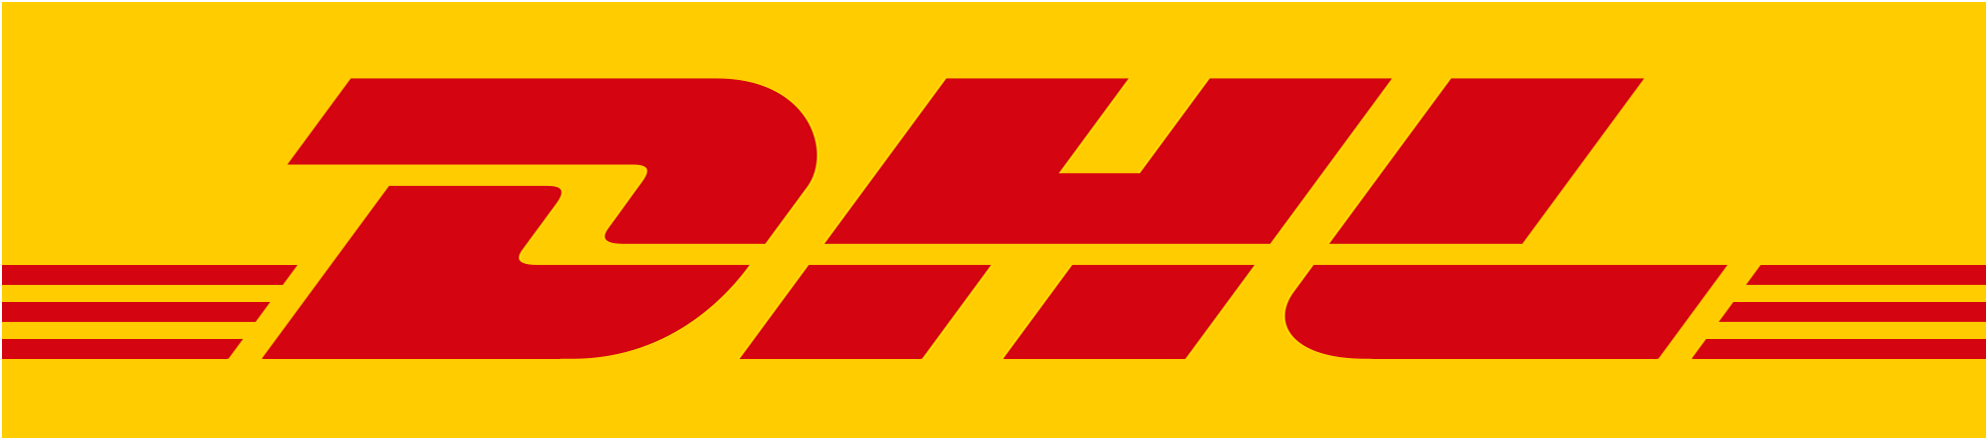 DHL Exel Slovakia, s.r.o.